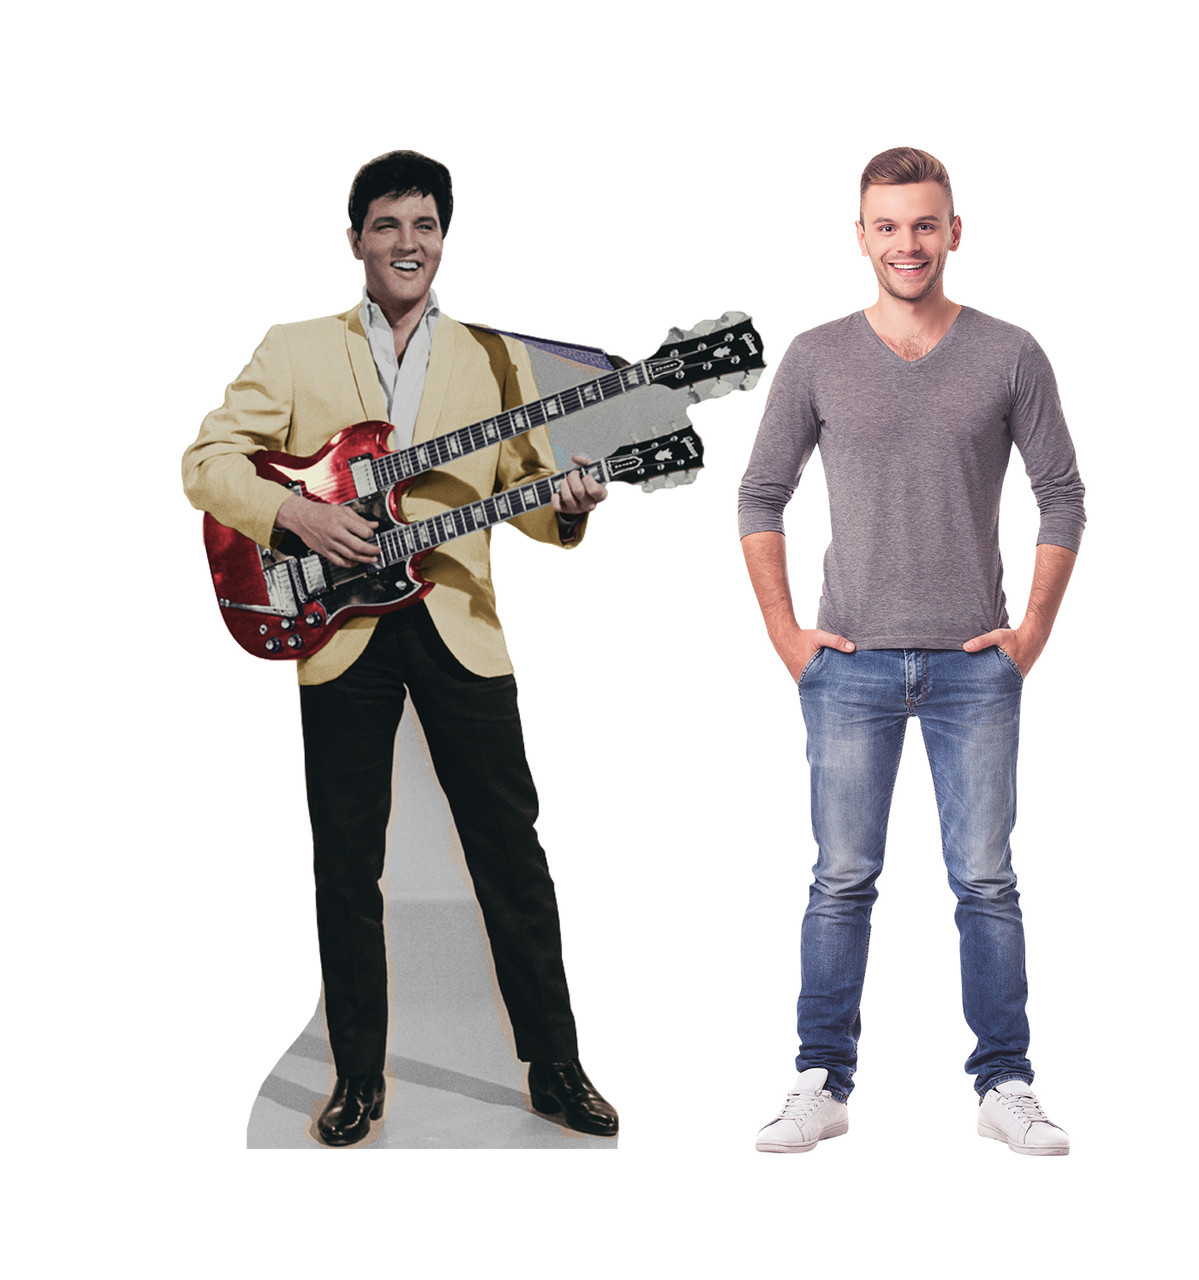 Elvis Yellow Jacket - Cardboard Cutout 845